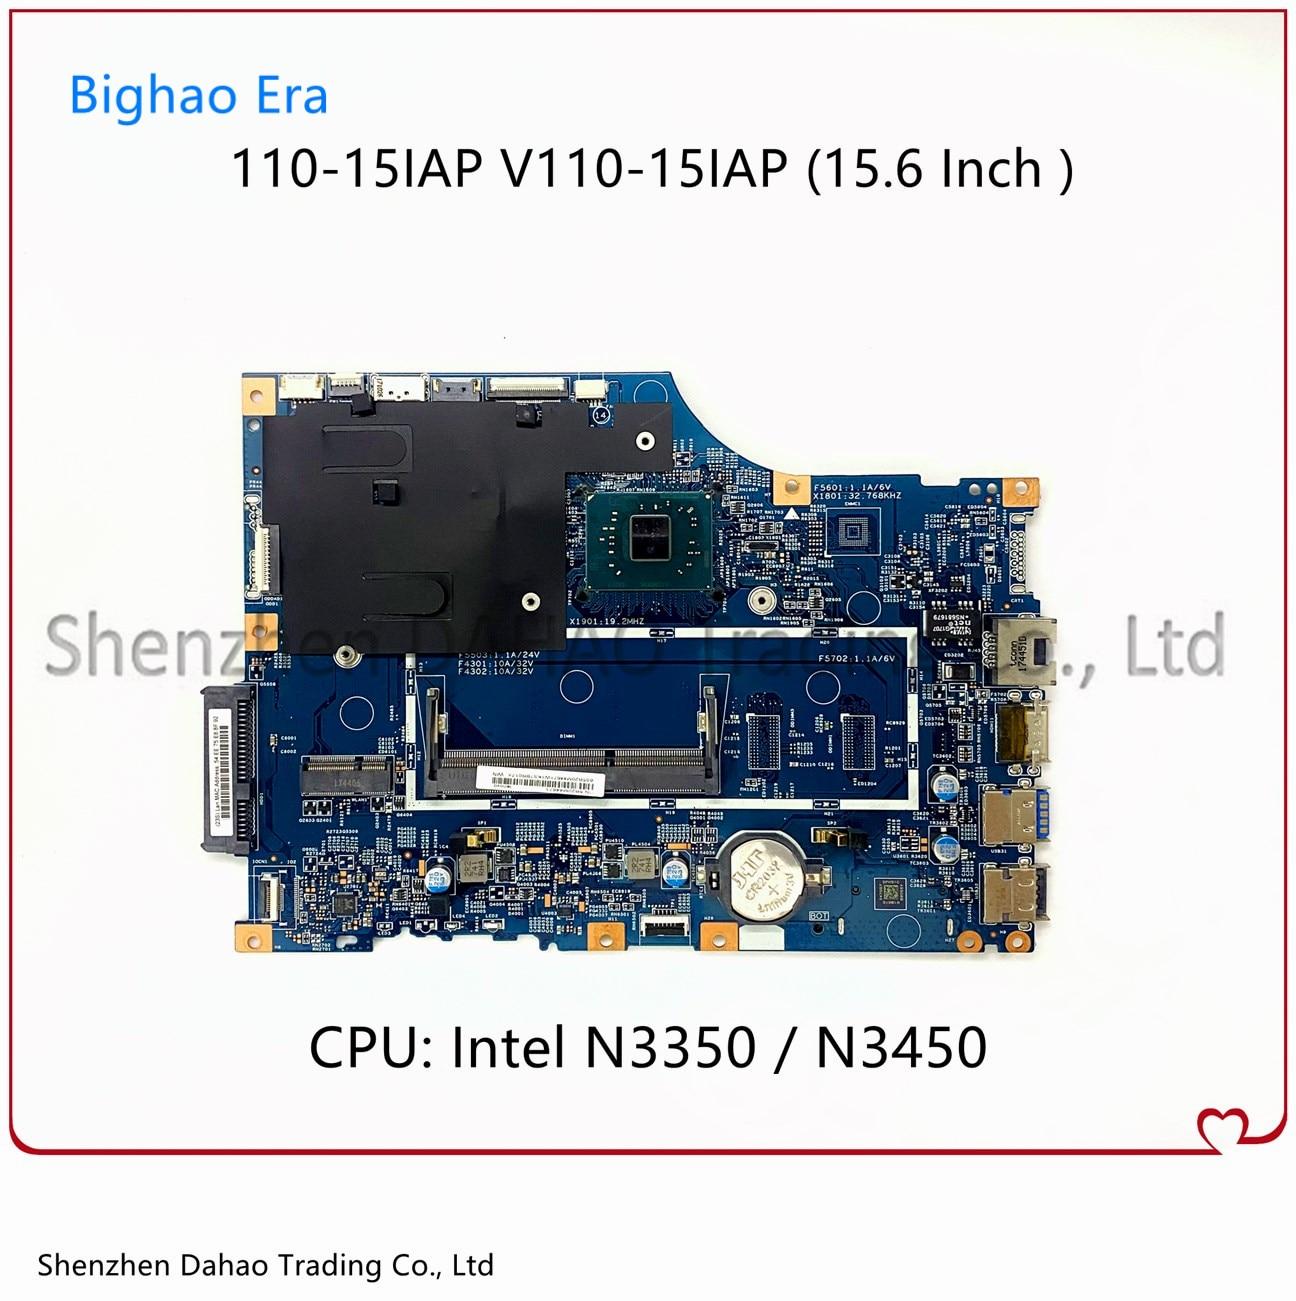 لينوفو V110 110-15IAP V110-15iAP اللوحة المحمول 15270-1 448.08A03.0011 مع N3350/N3450 CPU DDR3L 100% اختبار بالكامل